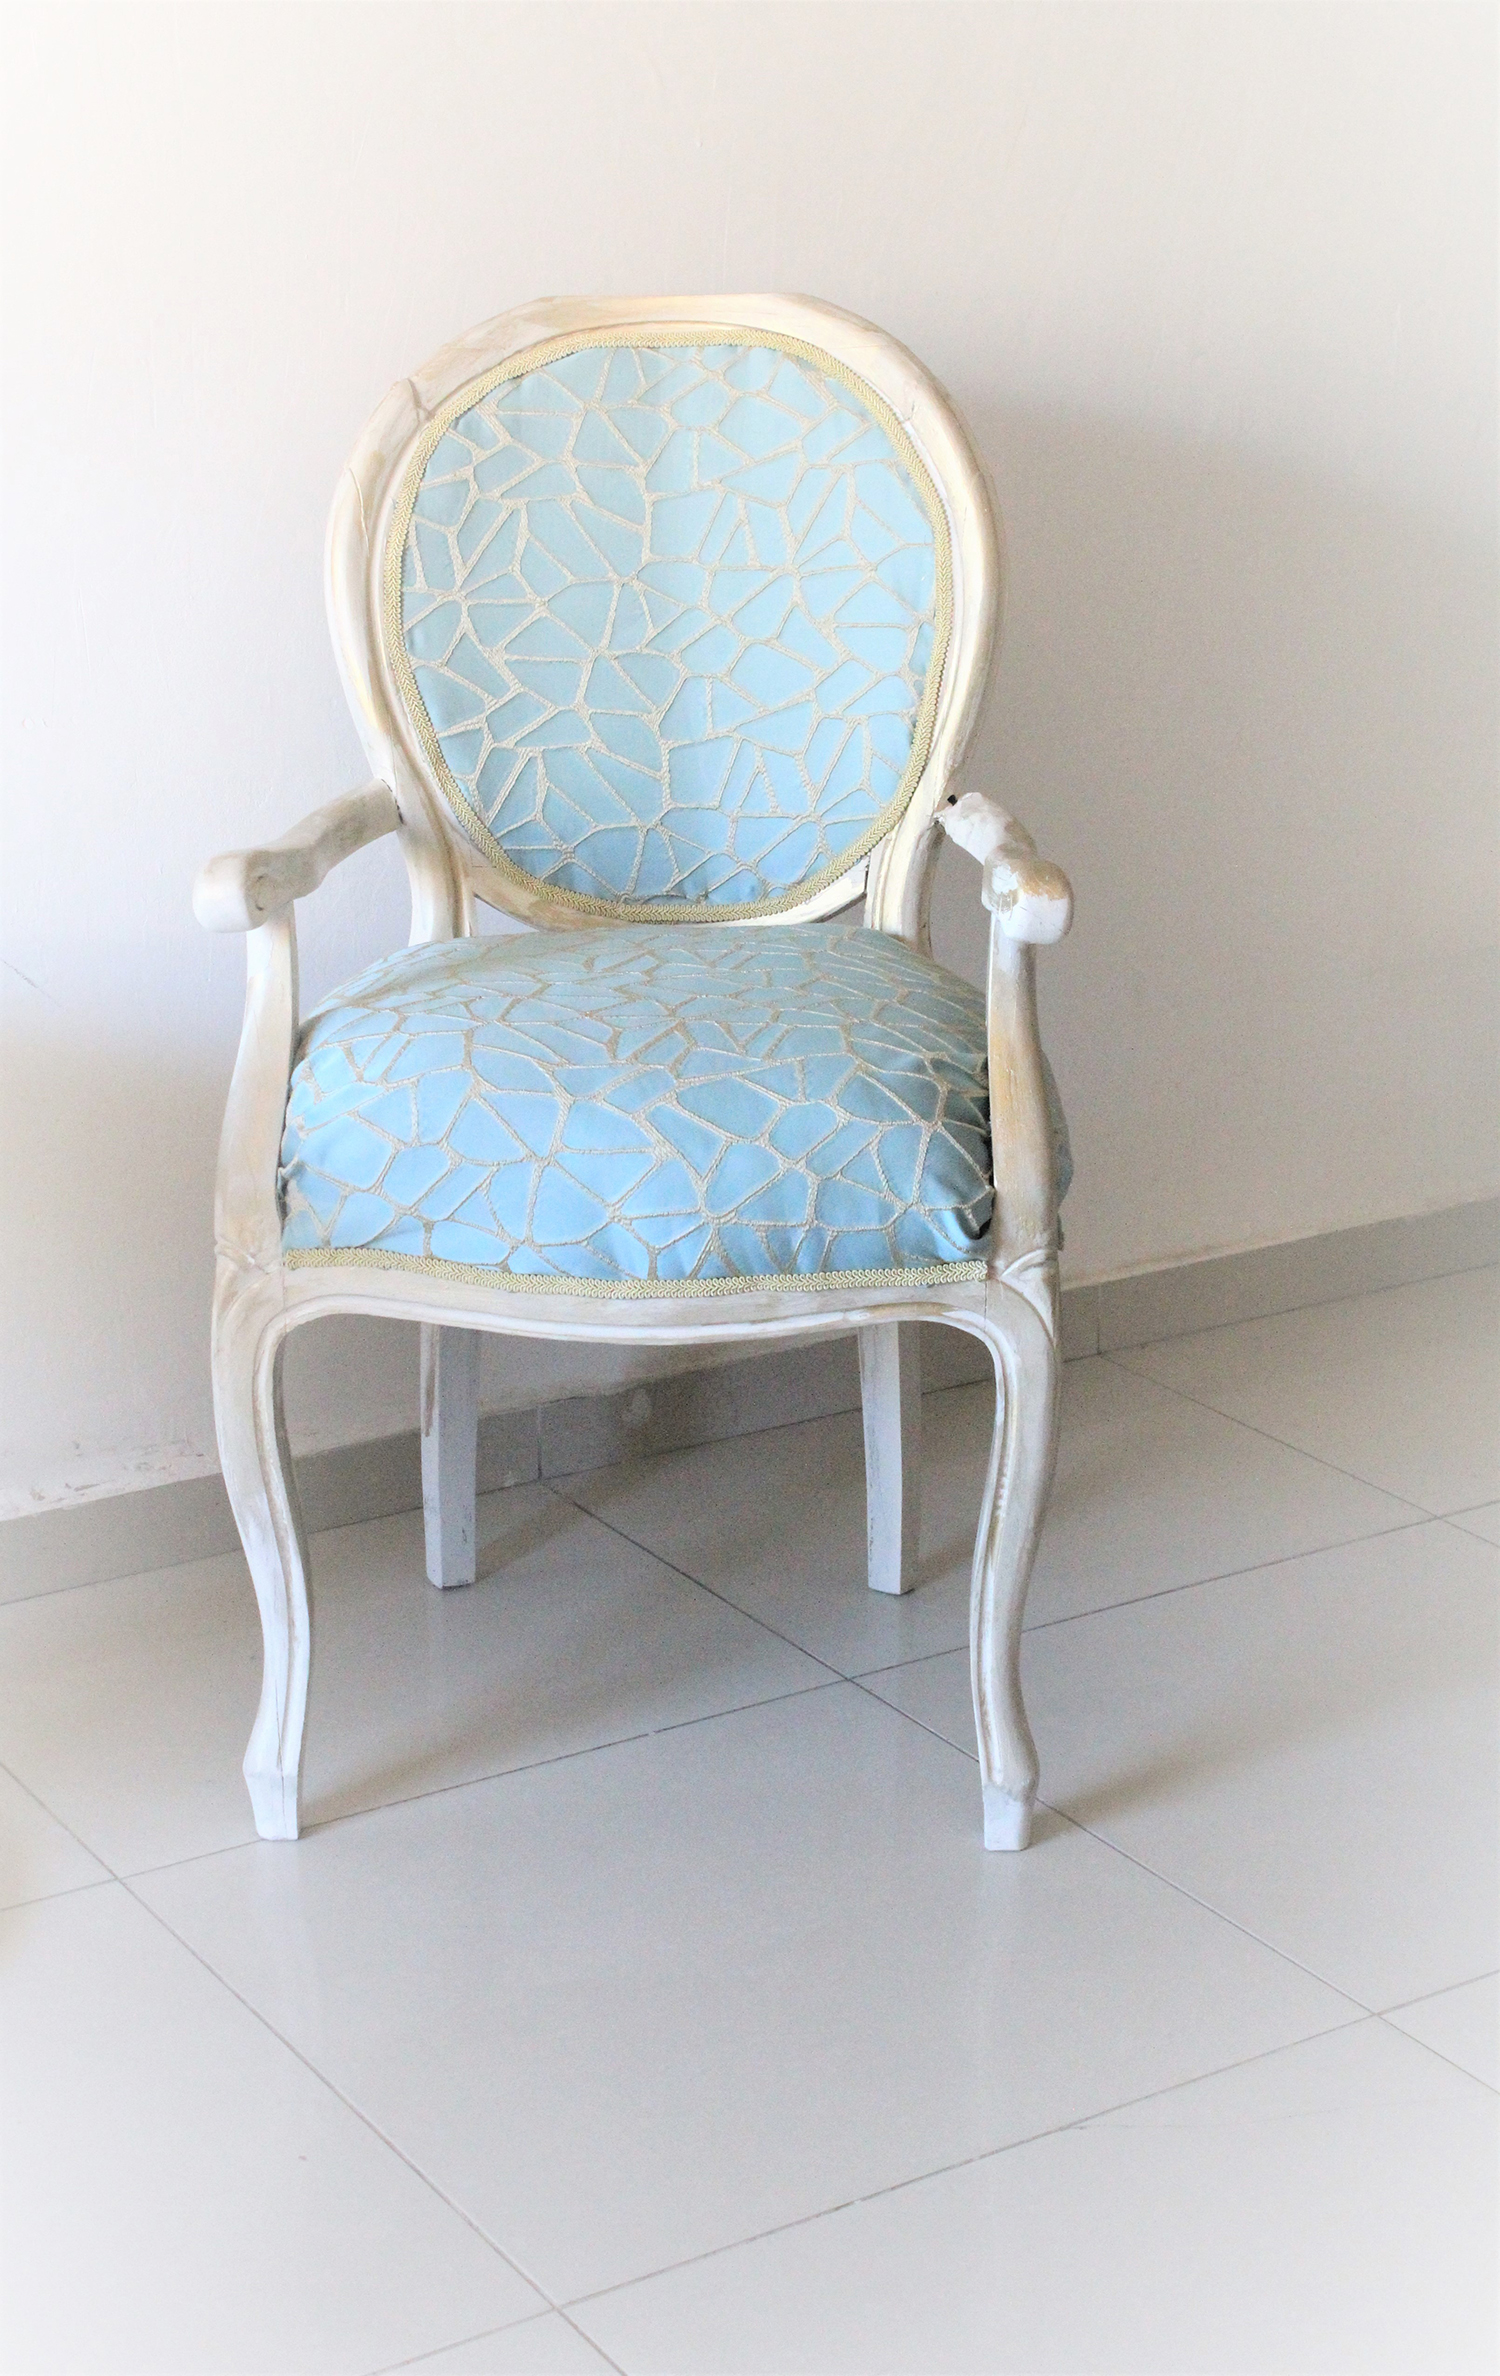 IMG 7425 - חידוש מחודש של שני כסאות